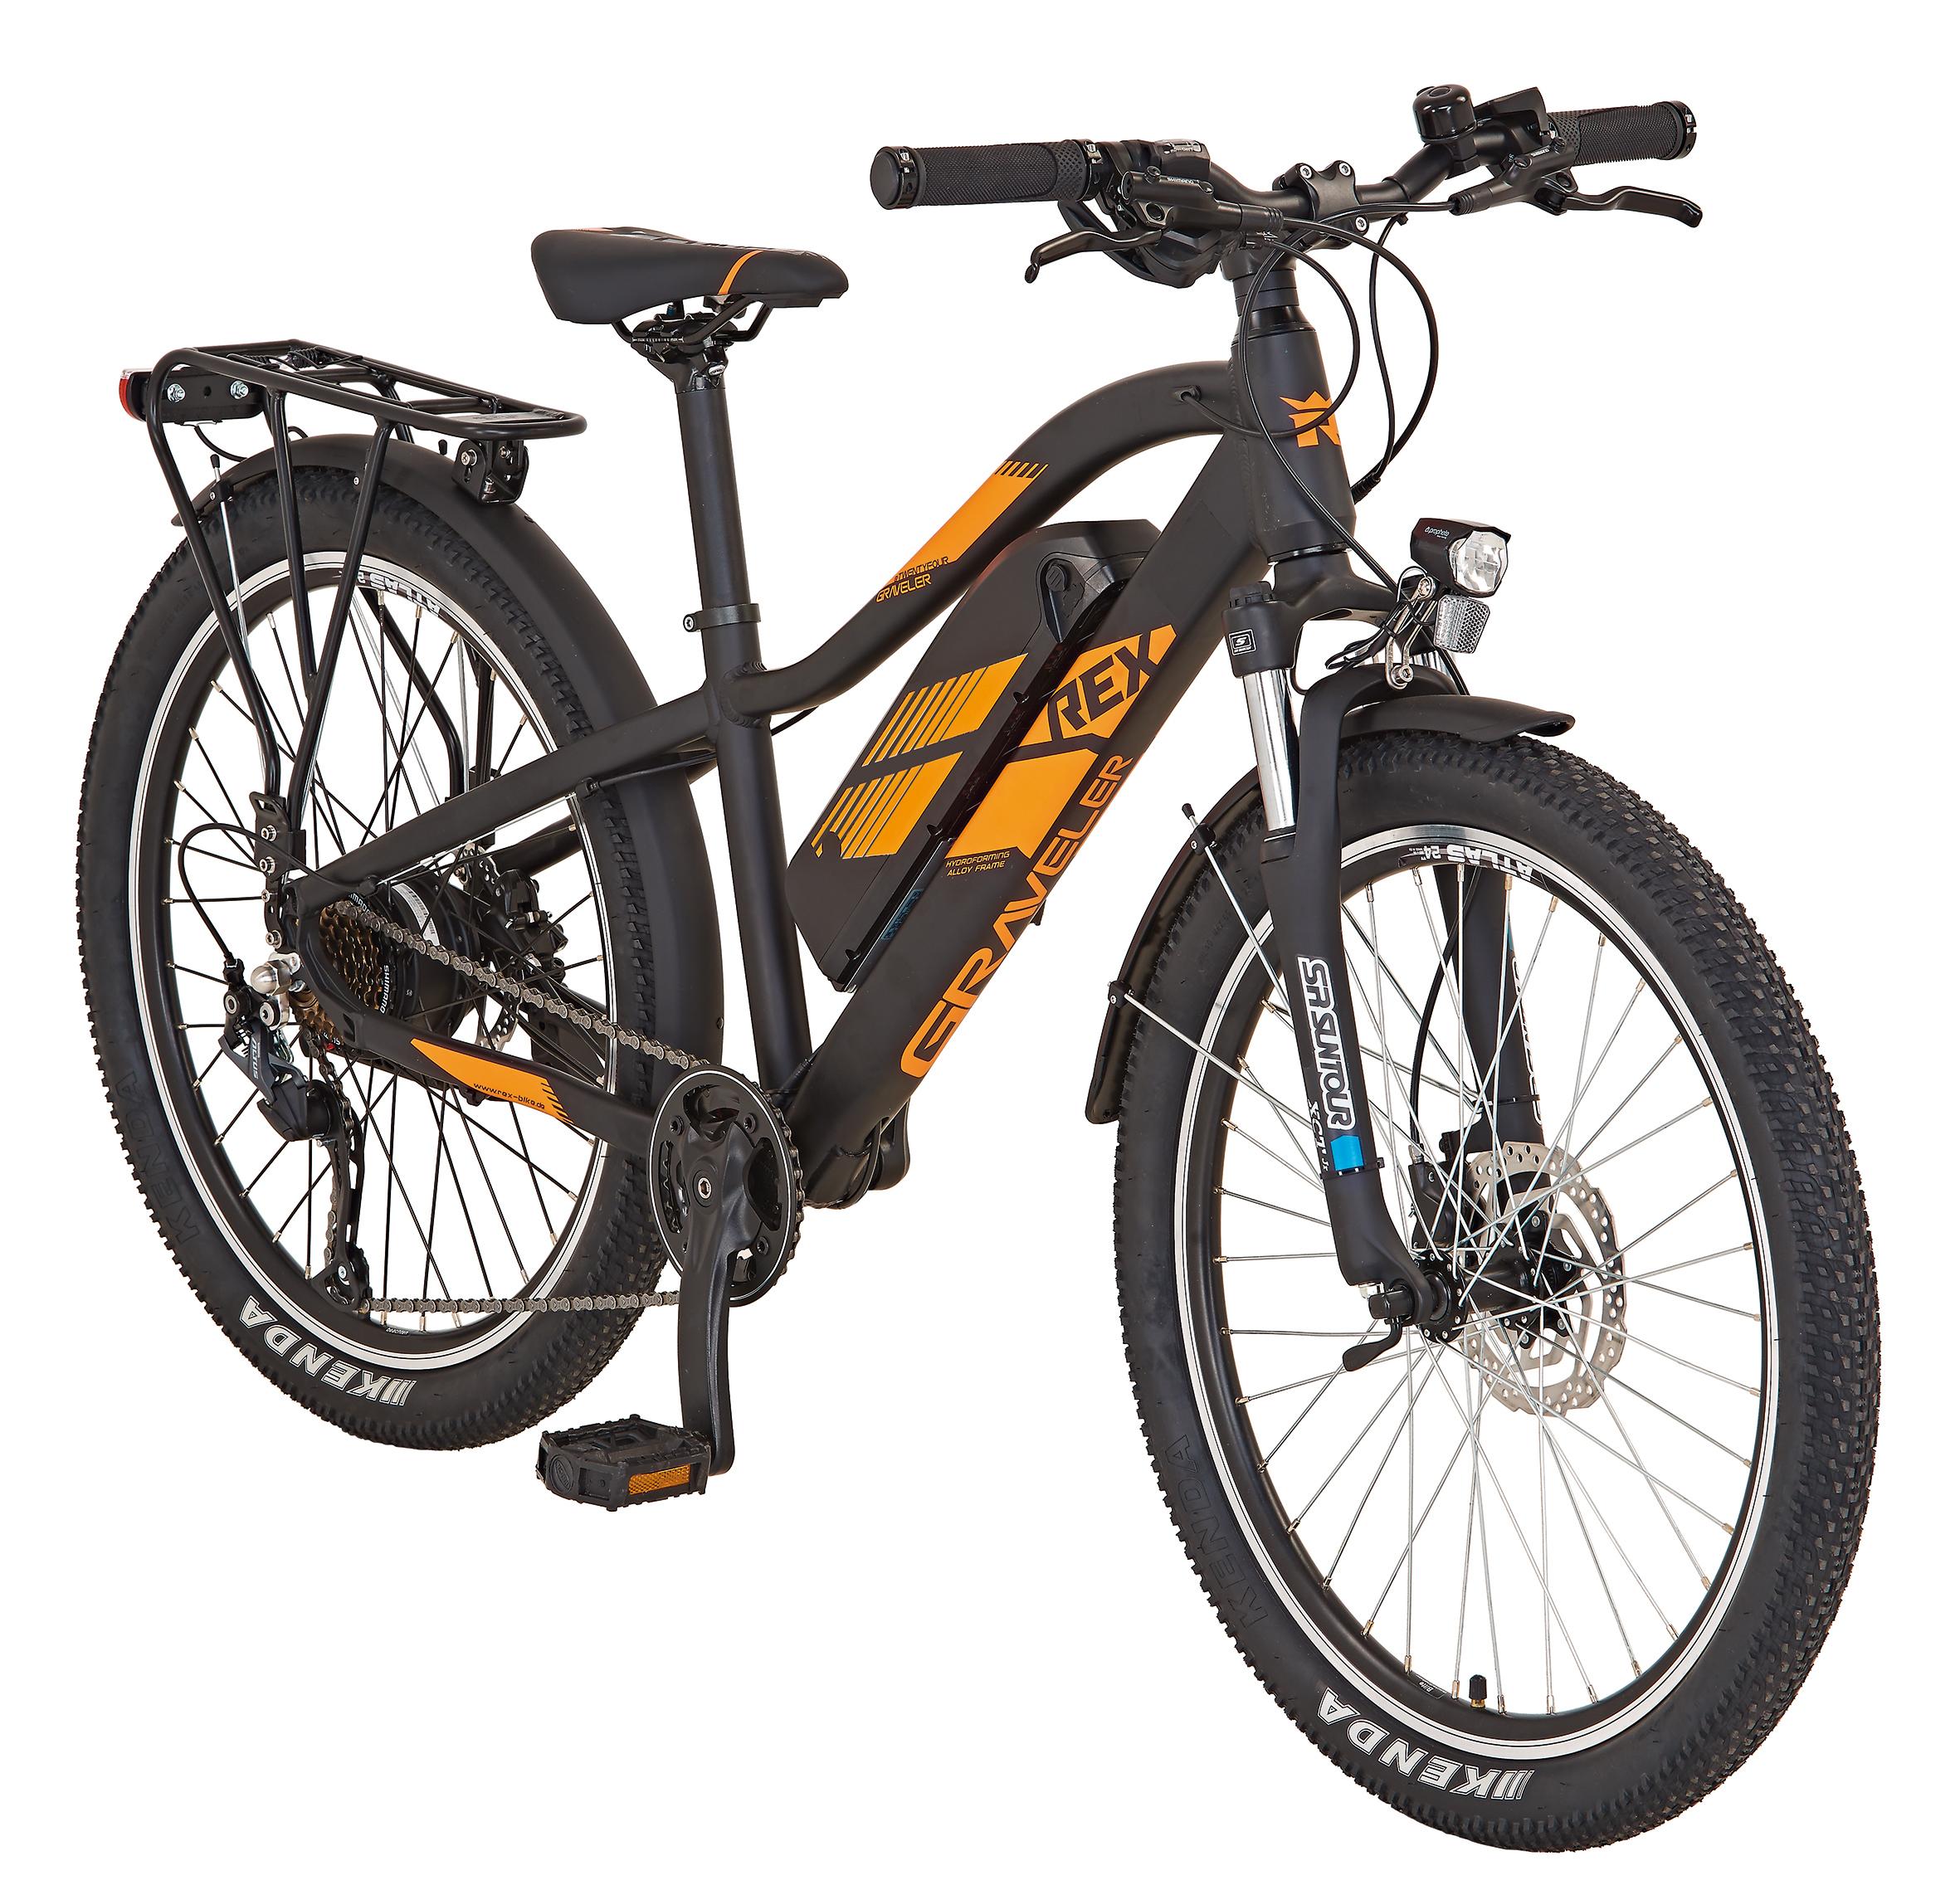 "Rex Bike Jugend Elektrofahrrad / E-All Terrain Bike Graveler Kids 24"" Bild 2"